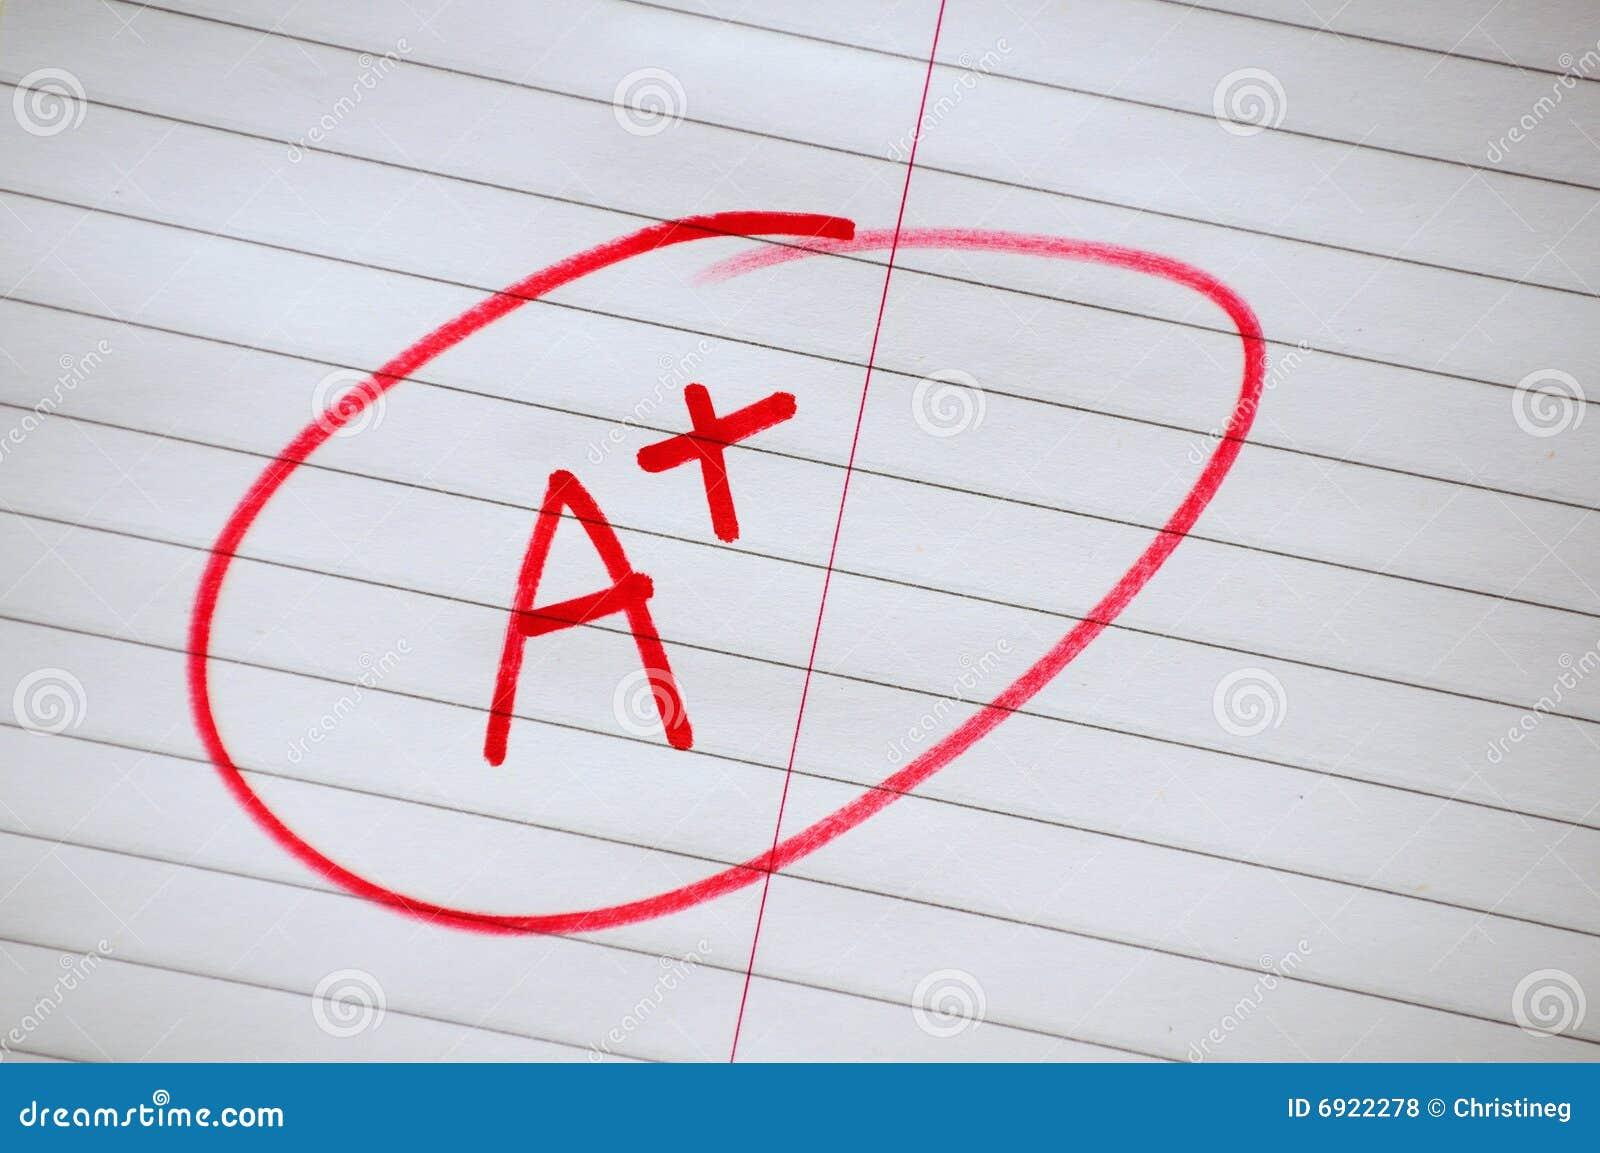 a plus stock photo  image of positive  exam  grade  plus